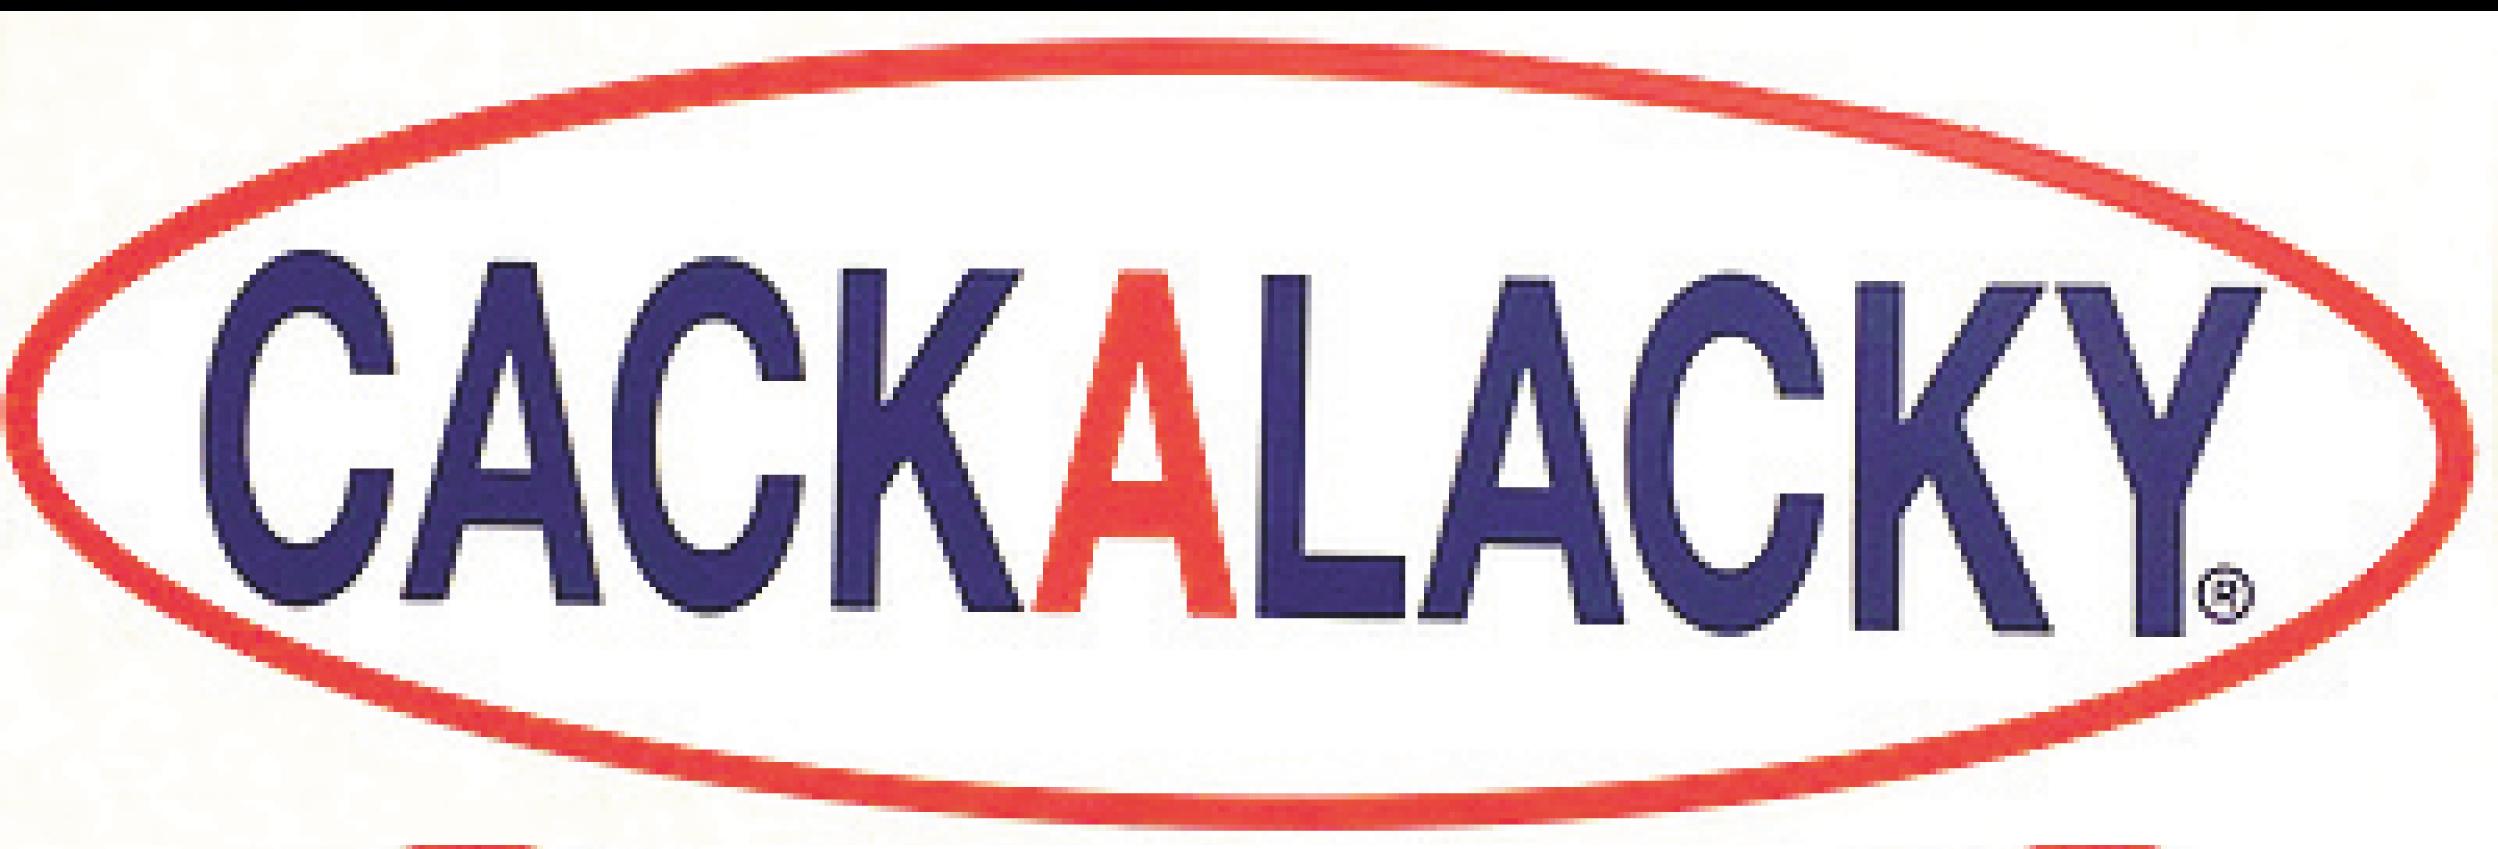 cackalacky-banner2.png